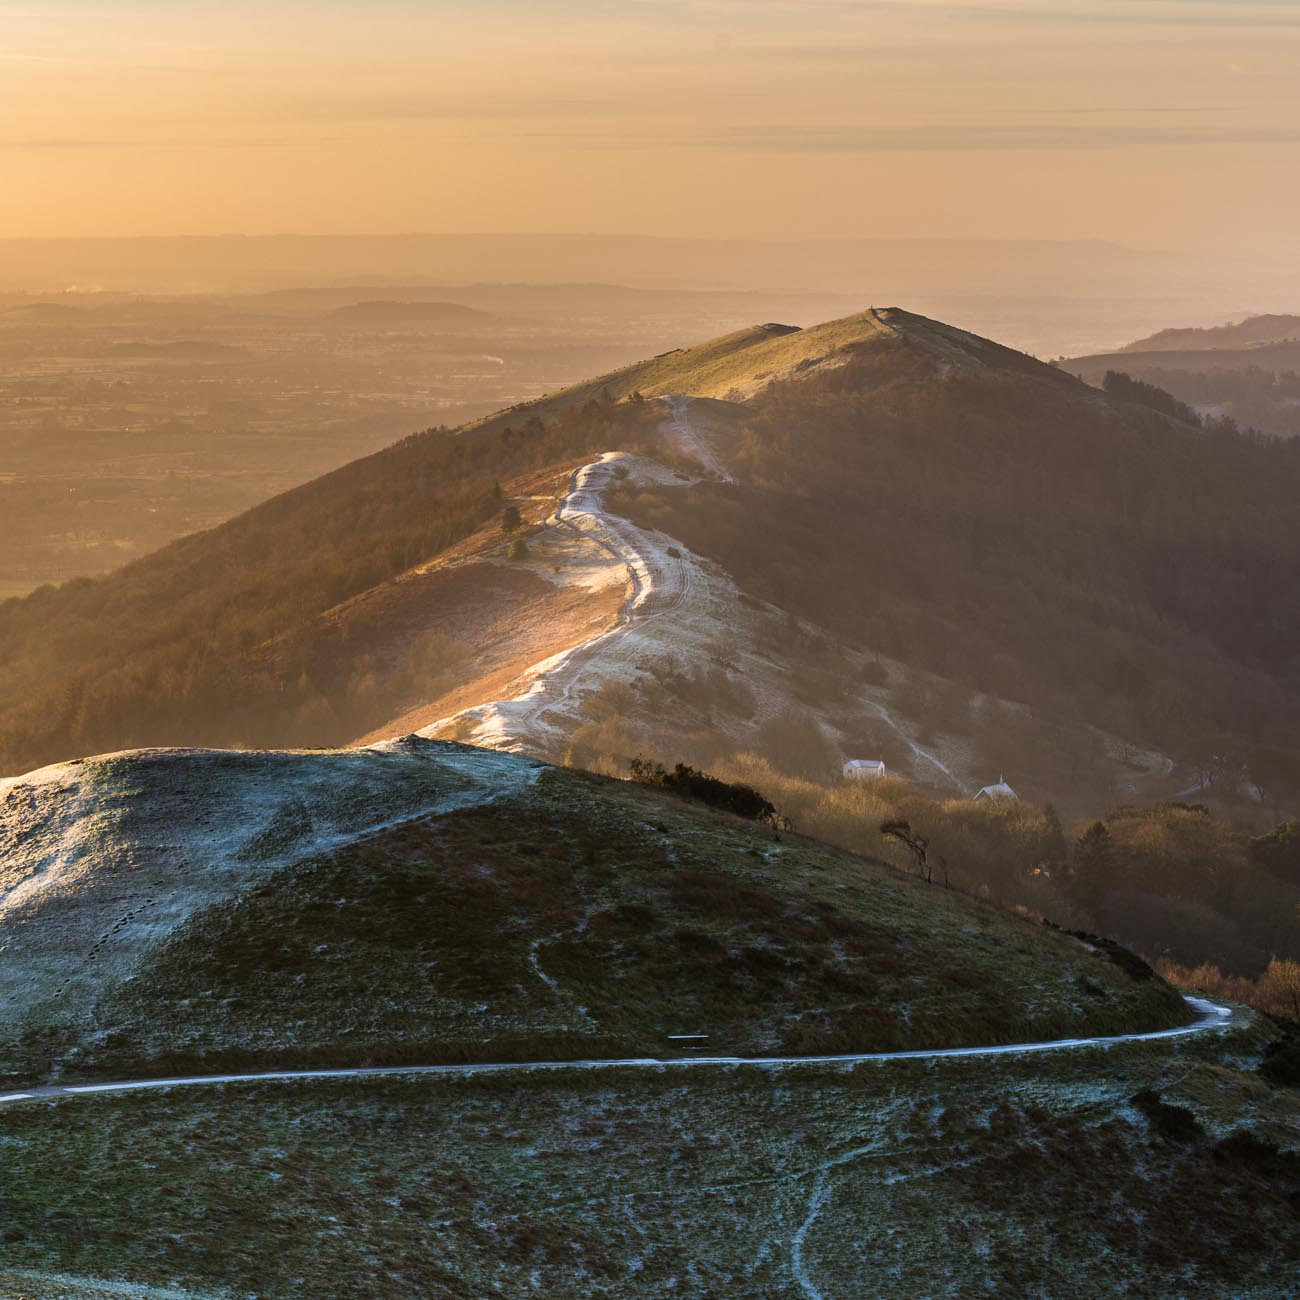 Sunrise on the Malvern Hills